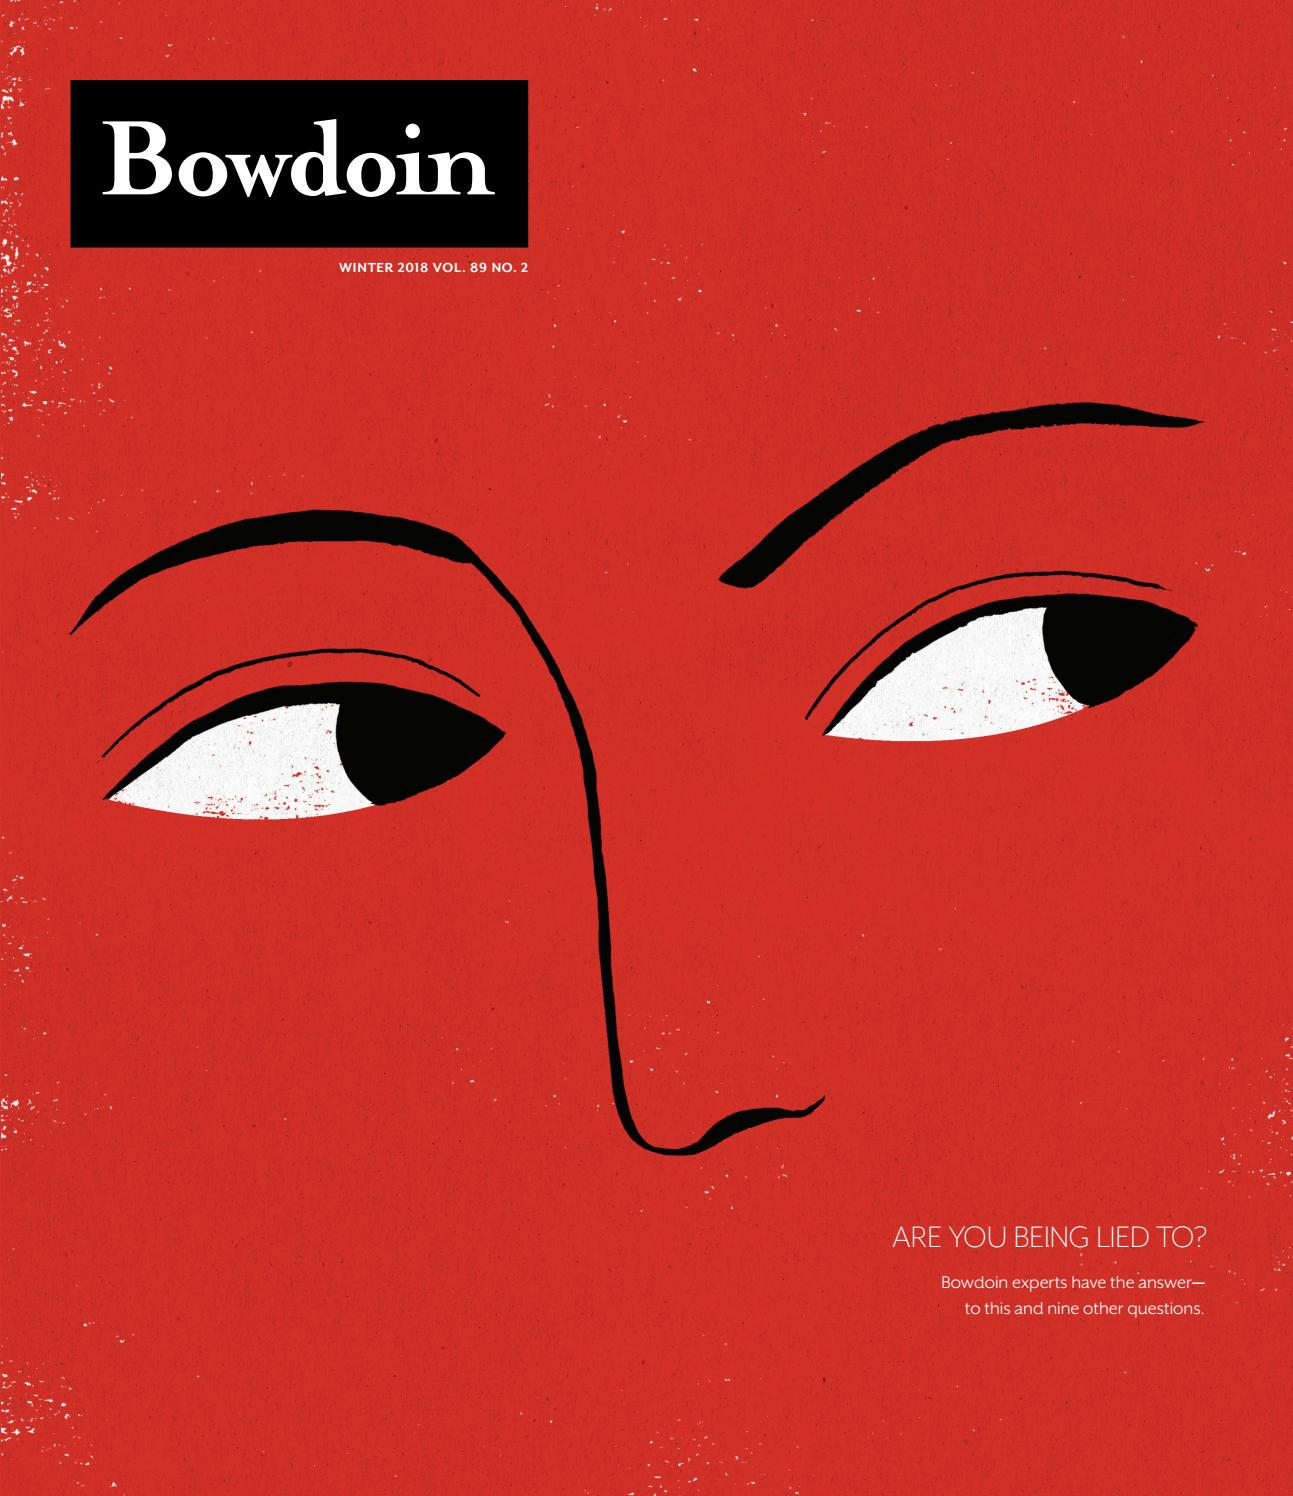 Bowdoin Winter 2018 Vol 89 No 2 By Bowdoin Magazine Issuu